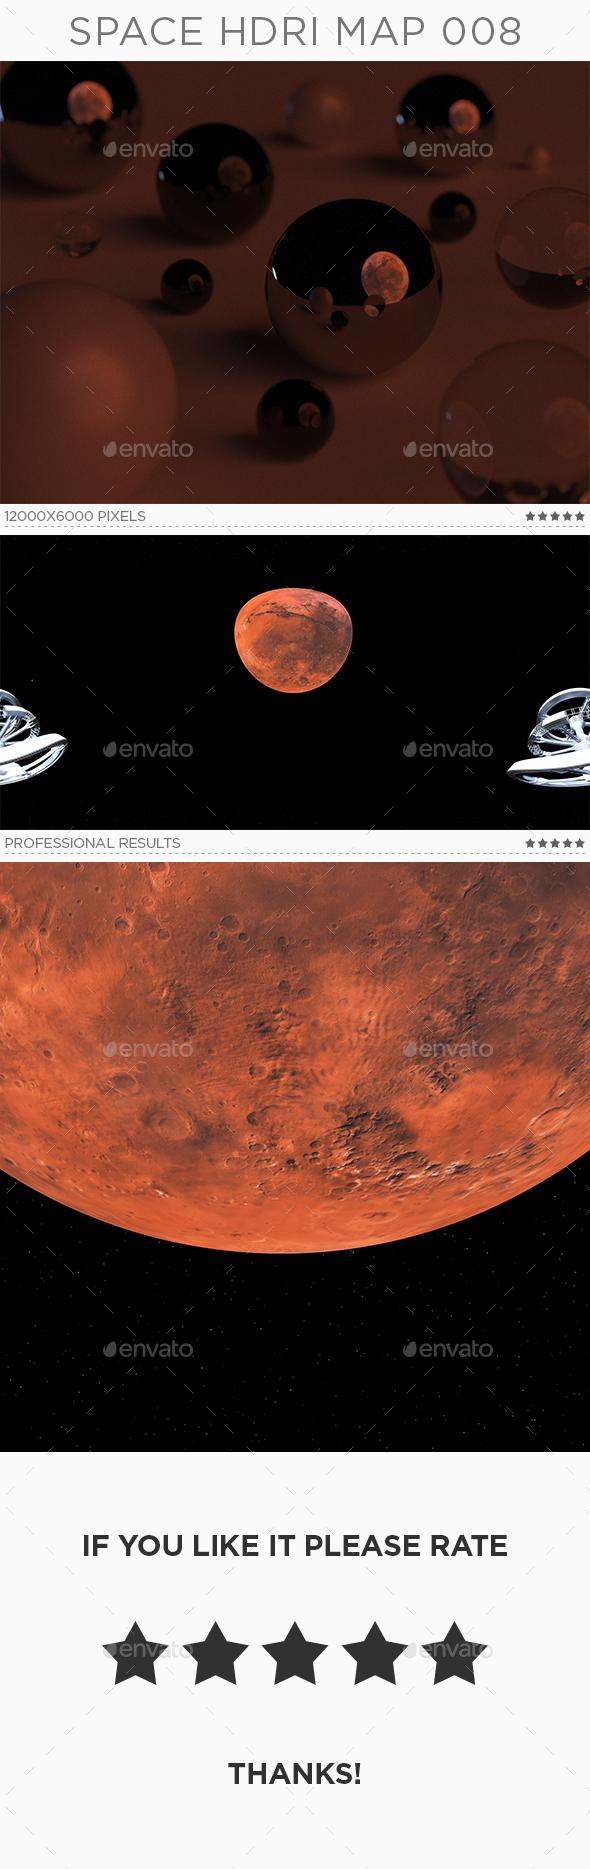 Space HDRi Map 008 - 3DOcean Item for Sale